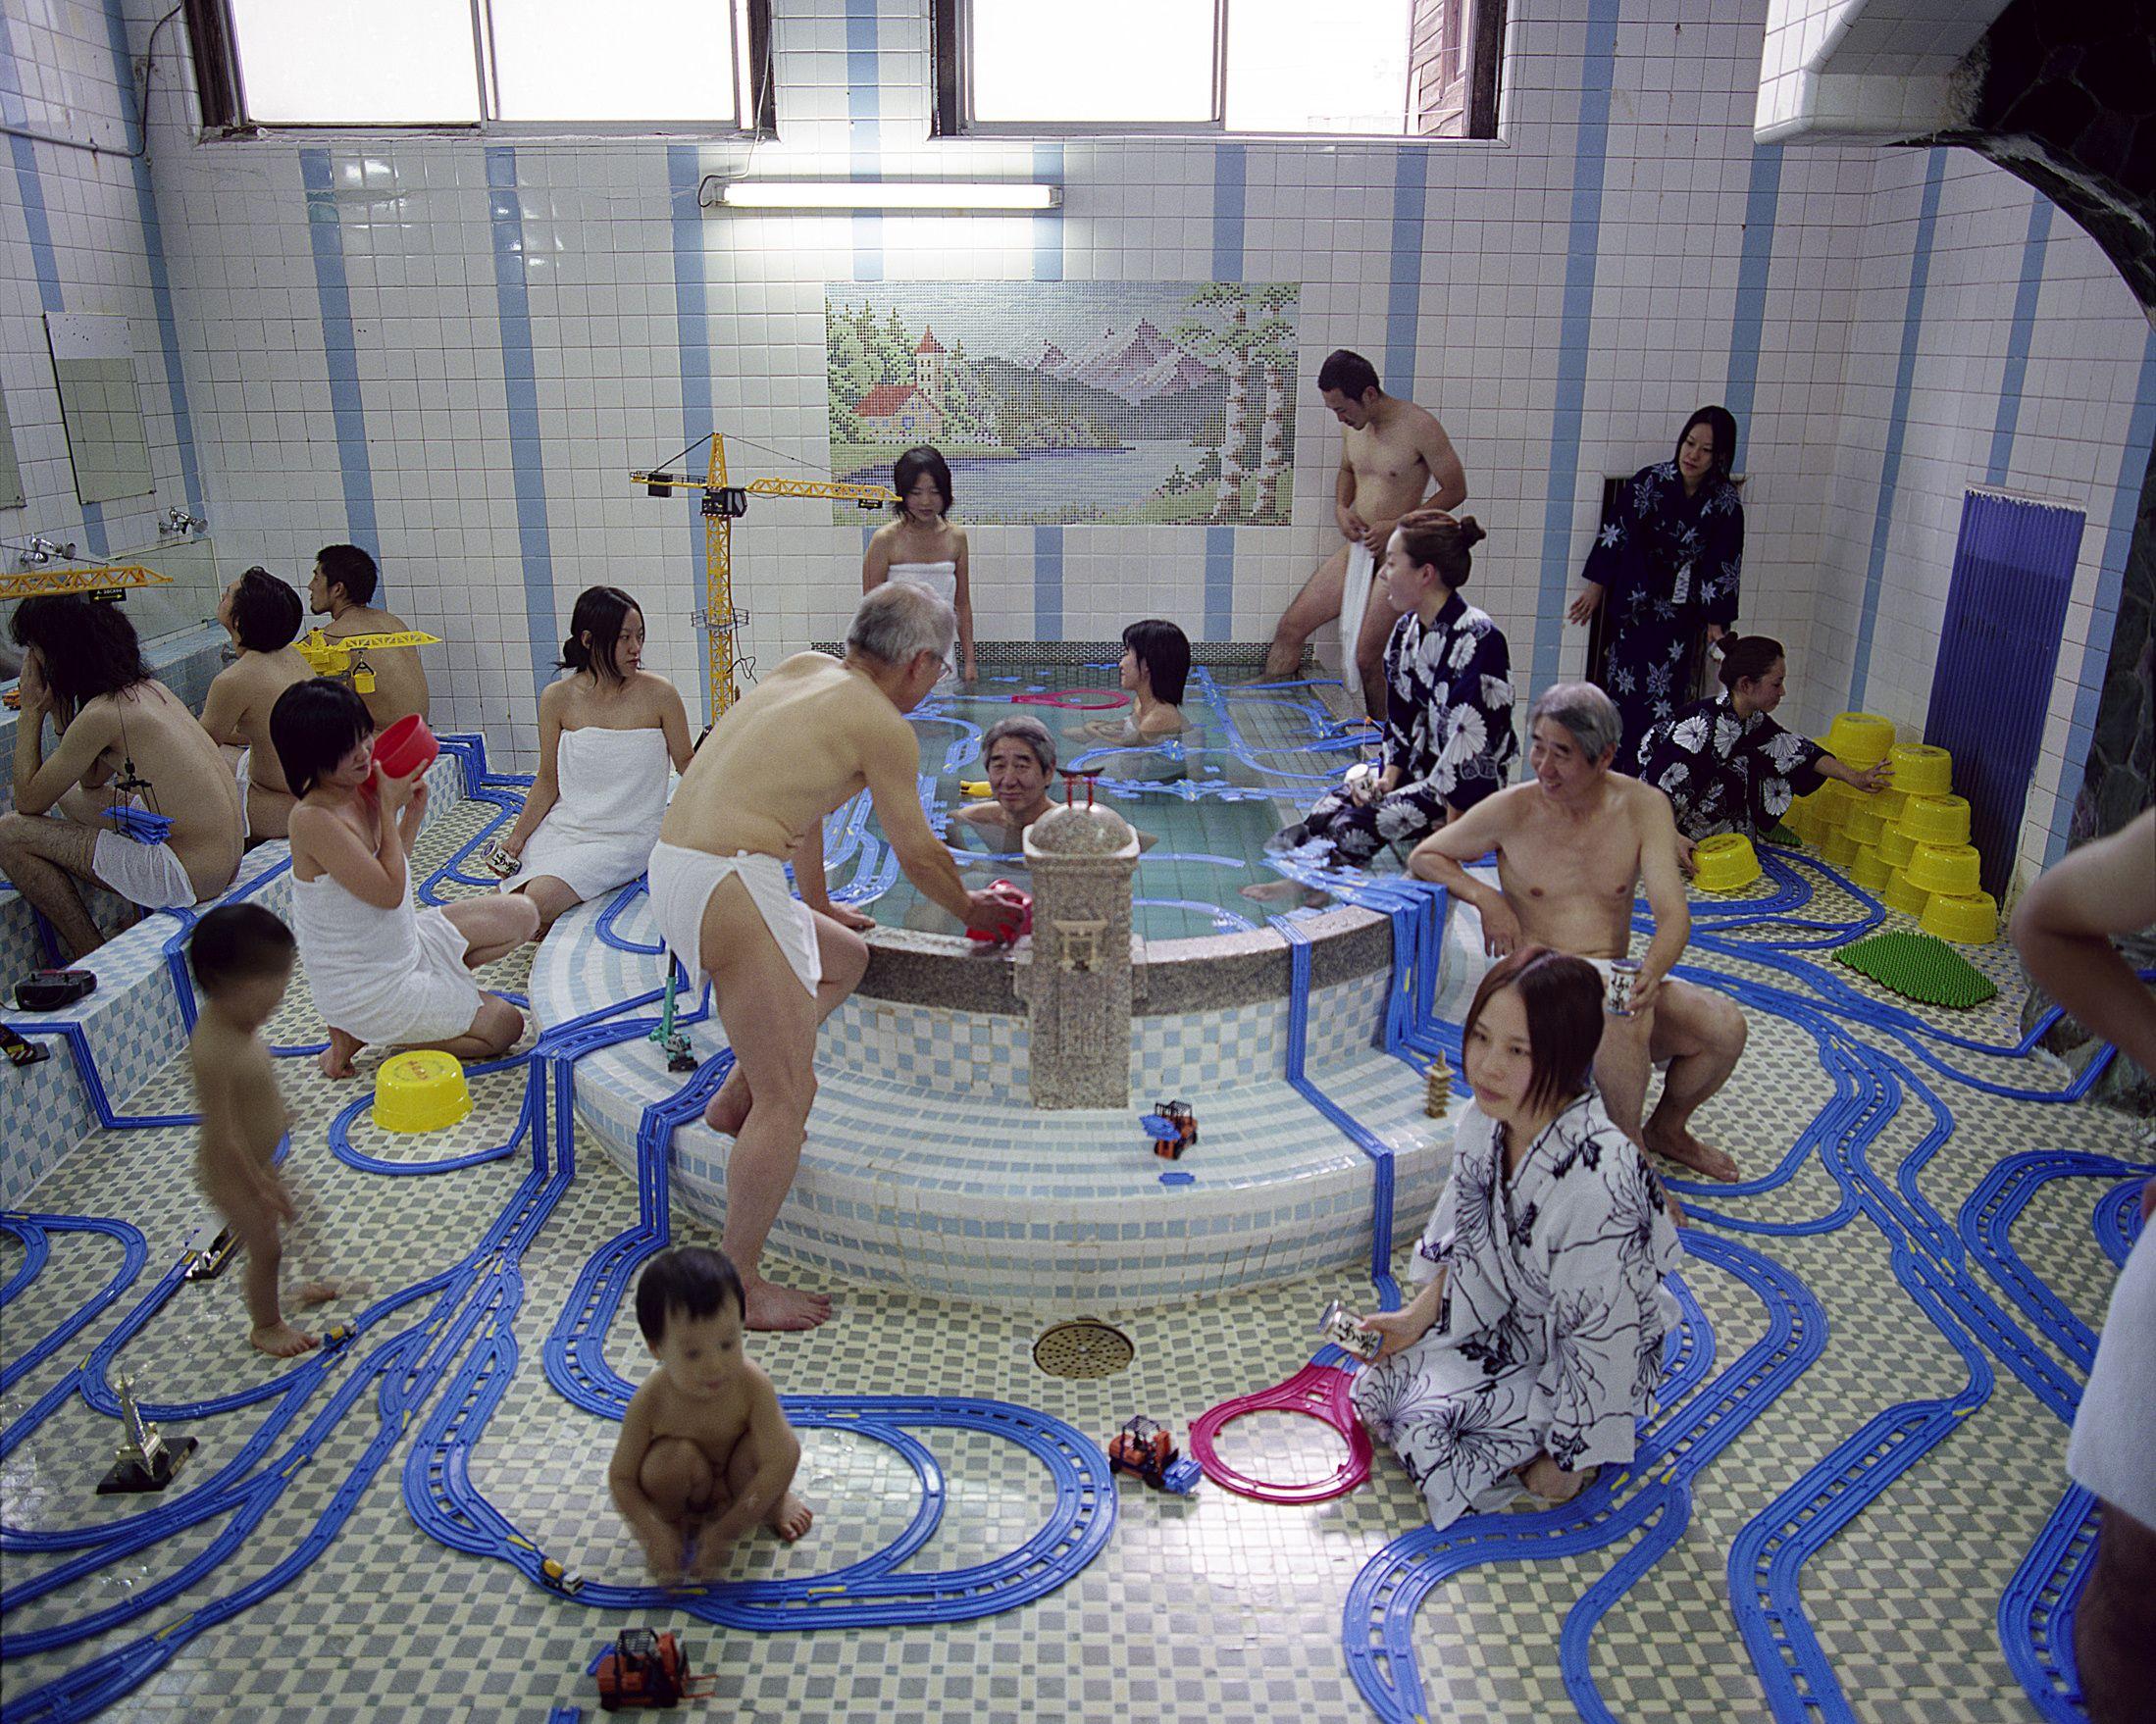 Unisex public bath house japan, best ass in women s porn